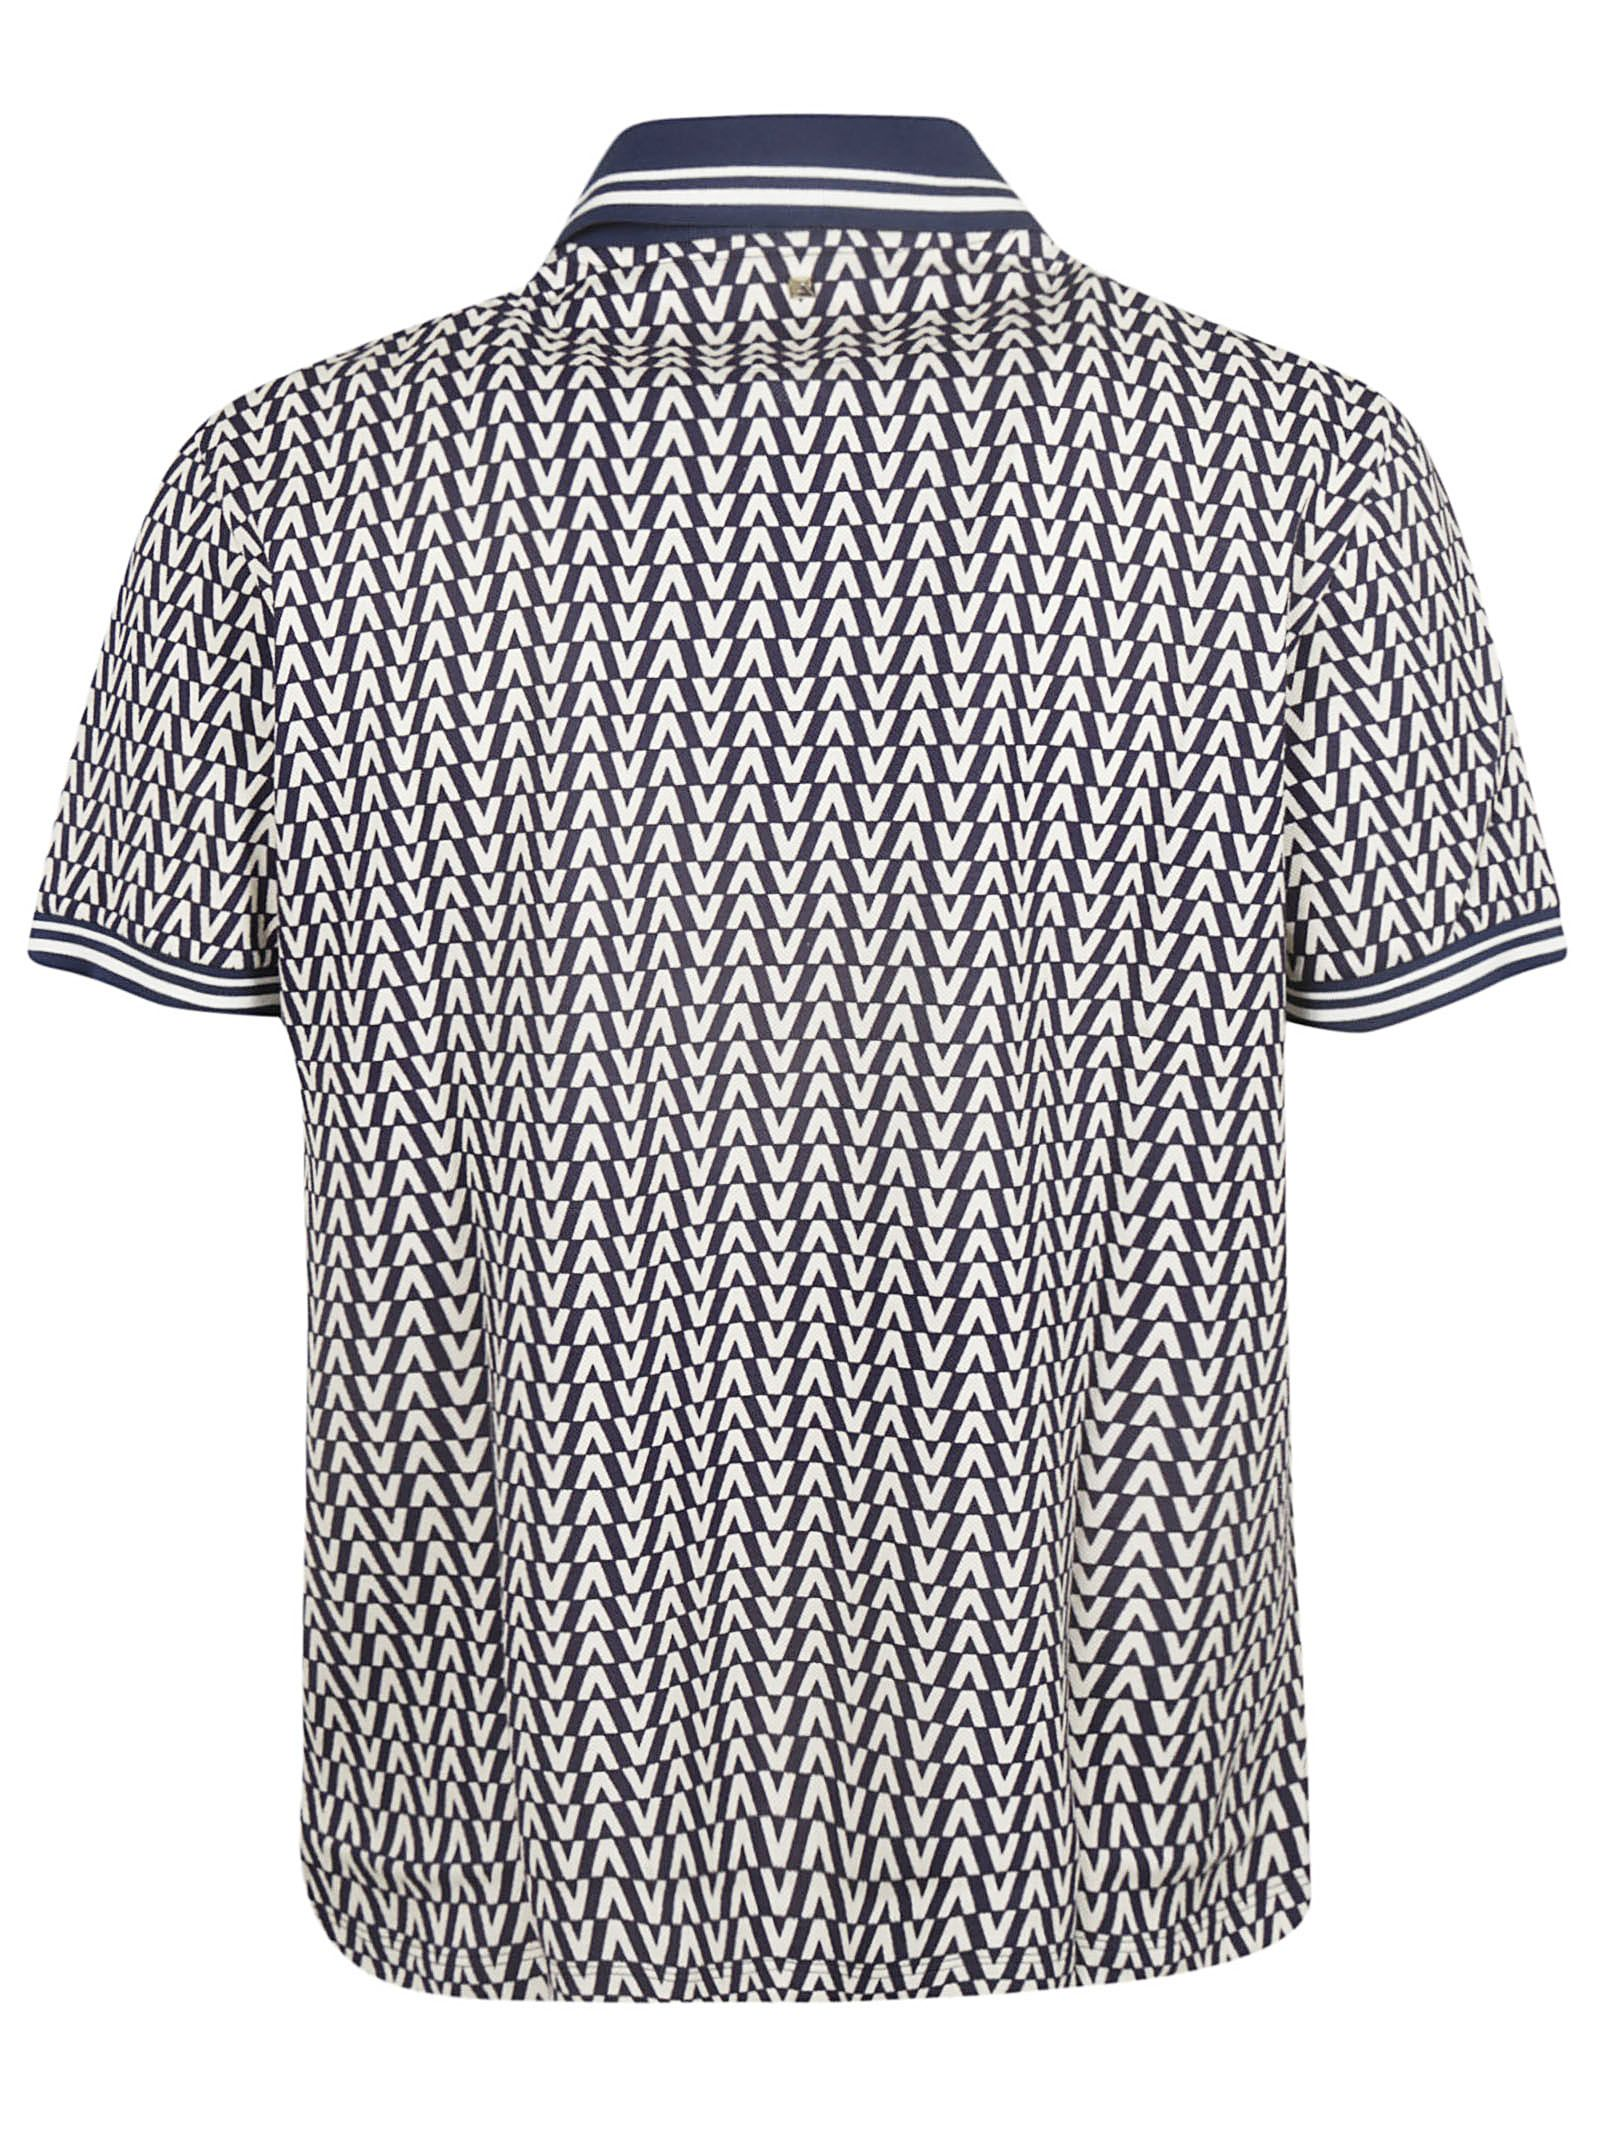 39b04c84 Valentino Valentino Optical Print Polo Shirt - 10853728 | italist